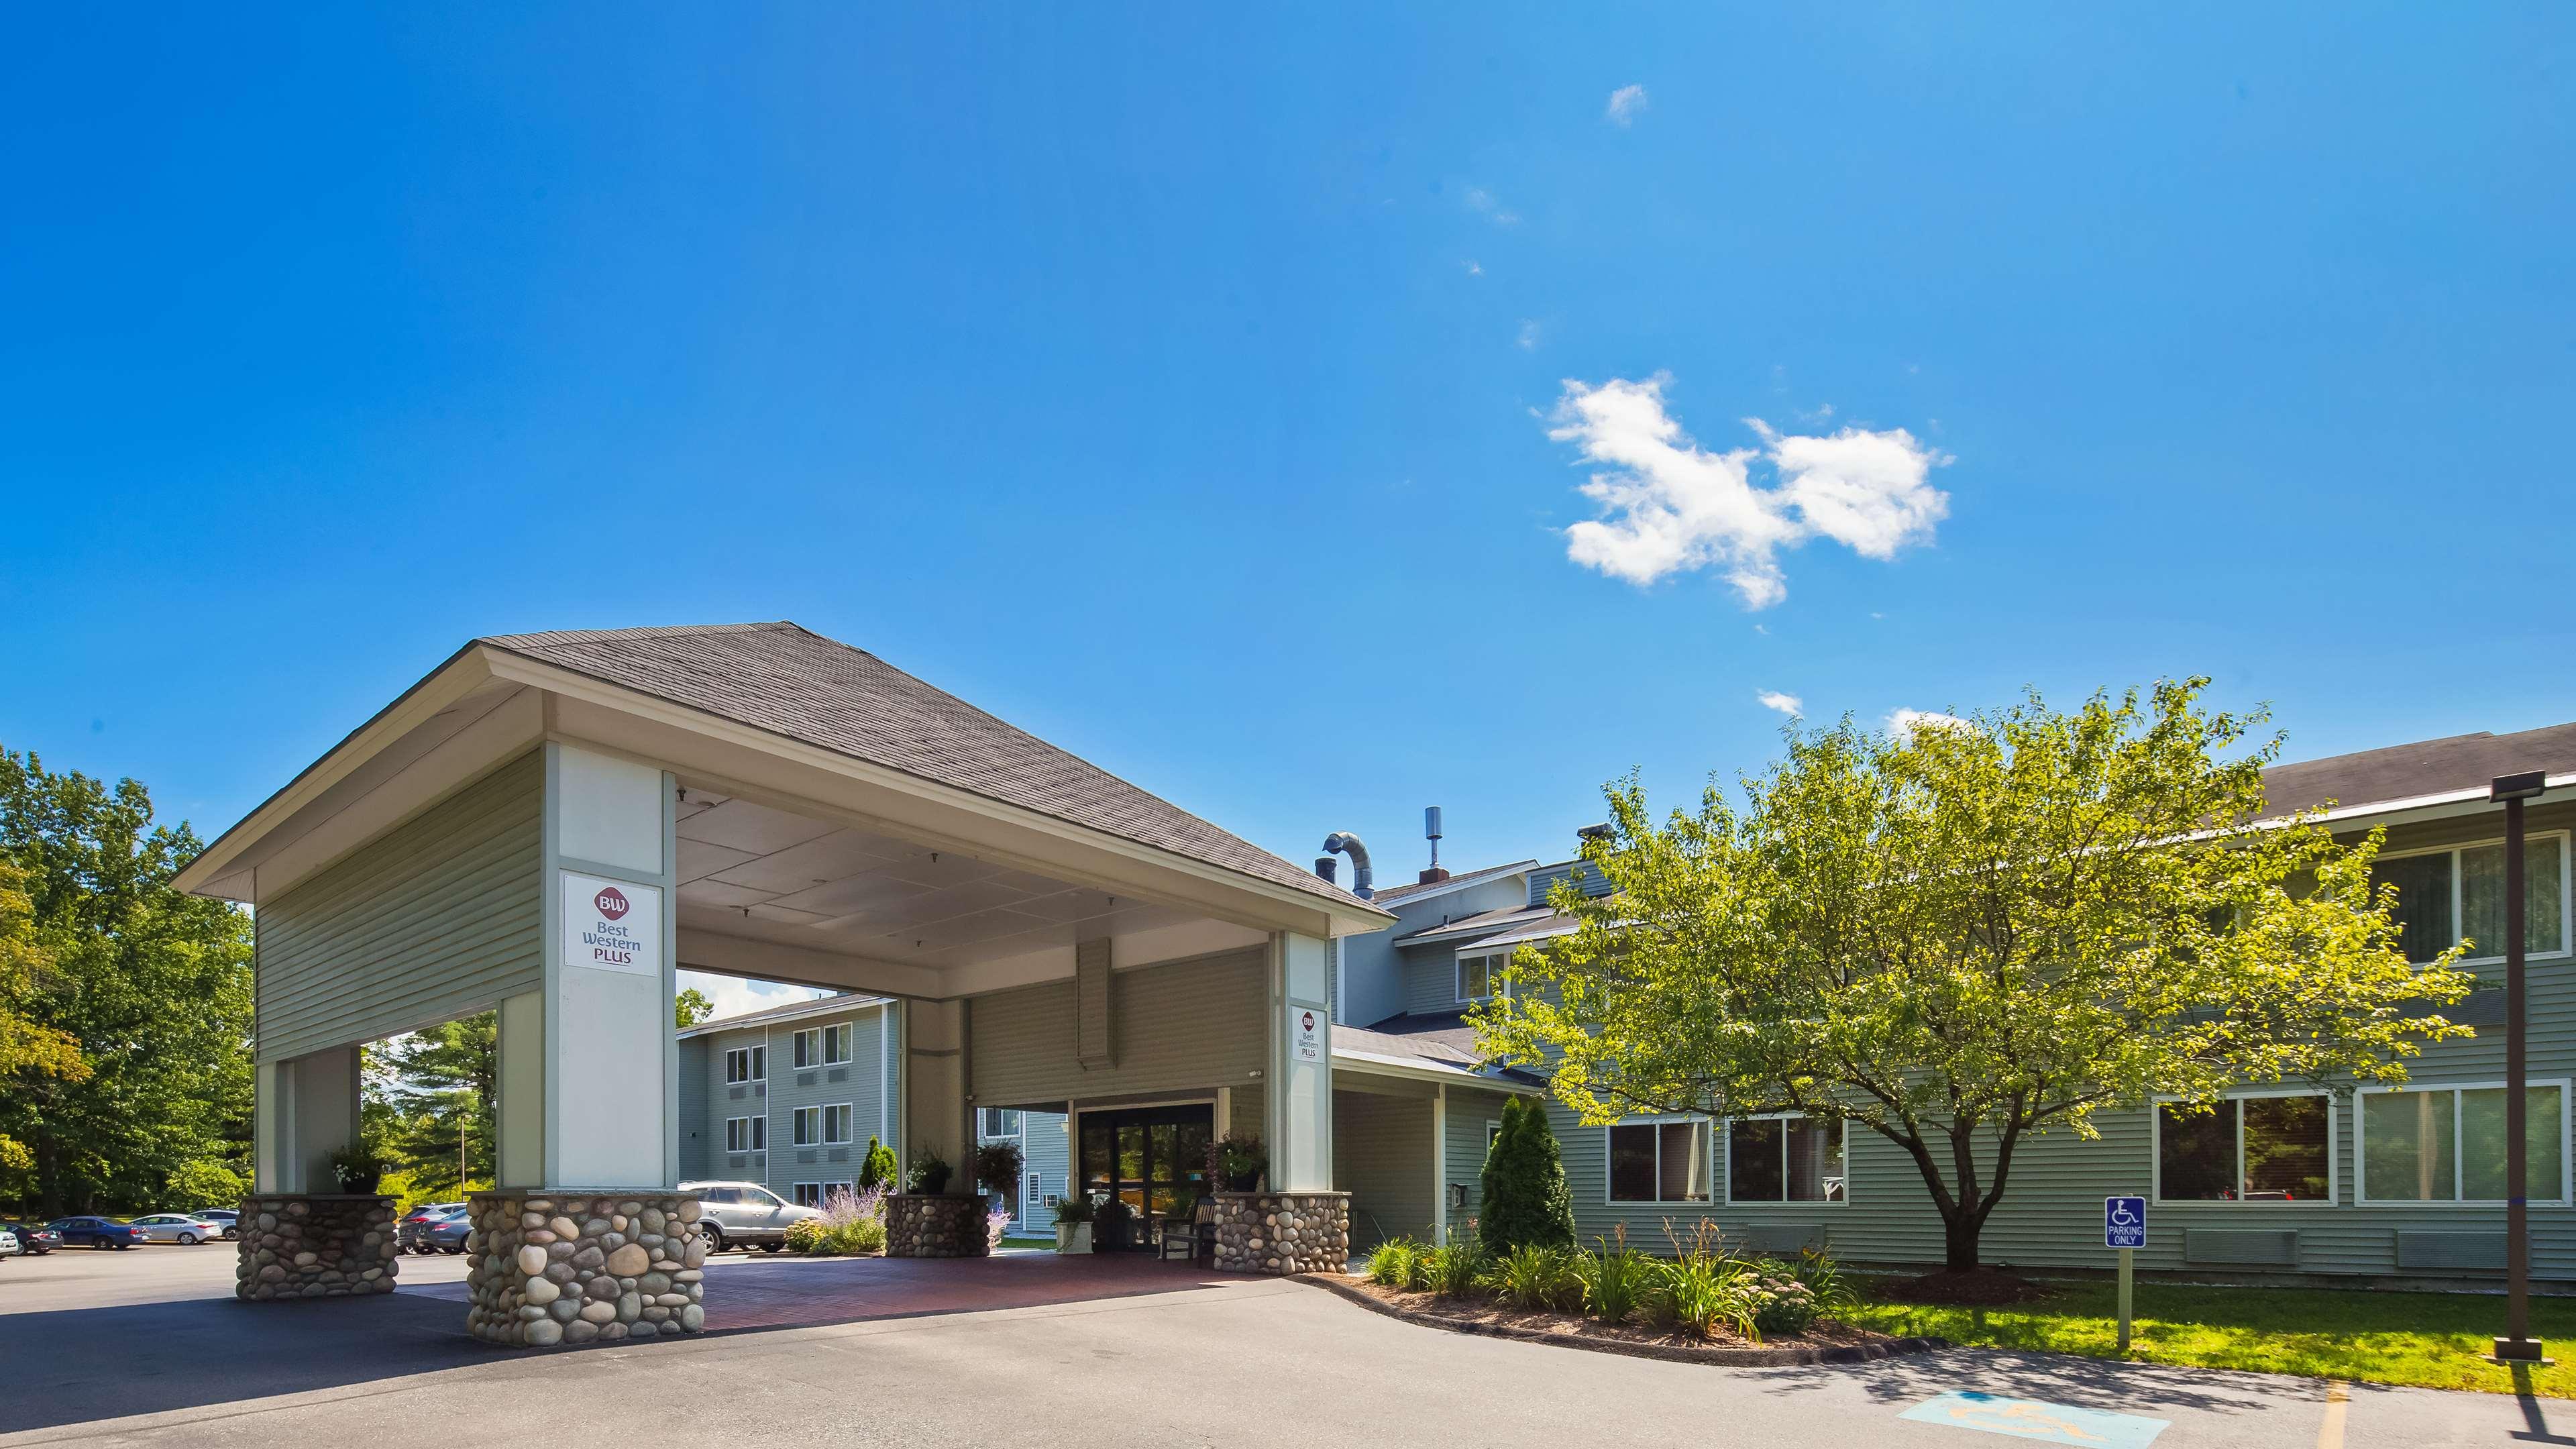 Best Western Plus Windjammer Inn & Conference Center image 0